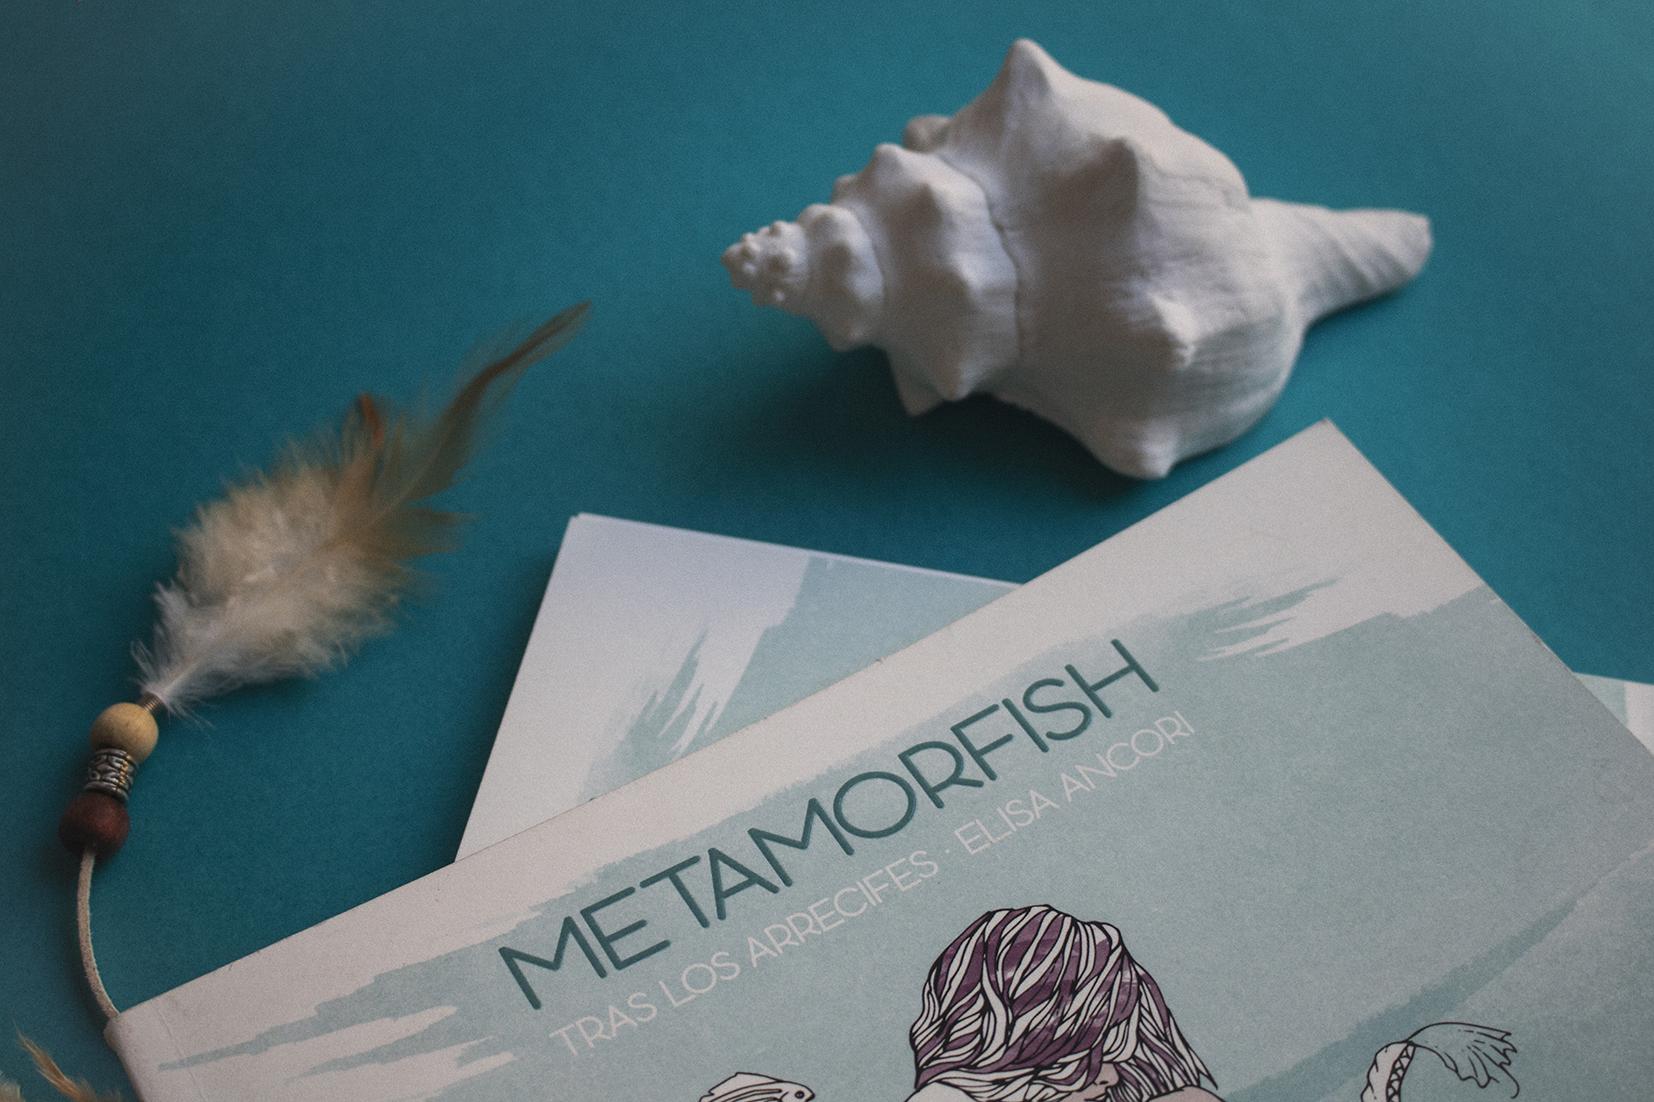 metamorfish_libro_elisaancori1.jpg